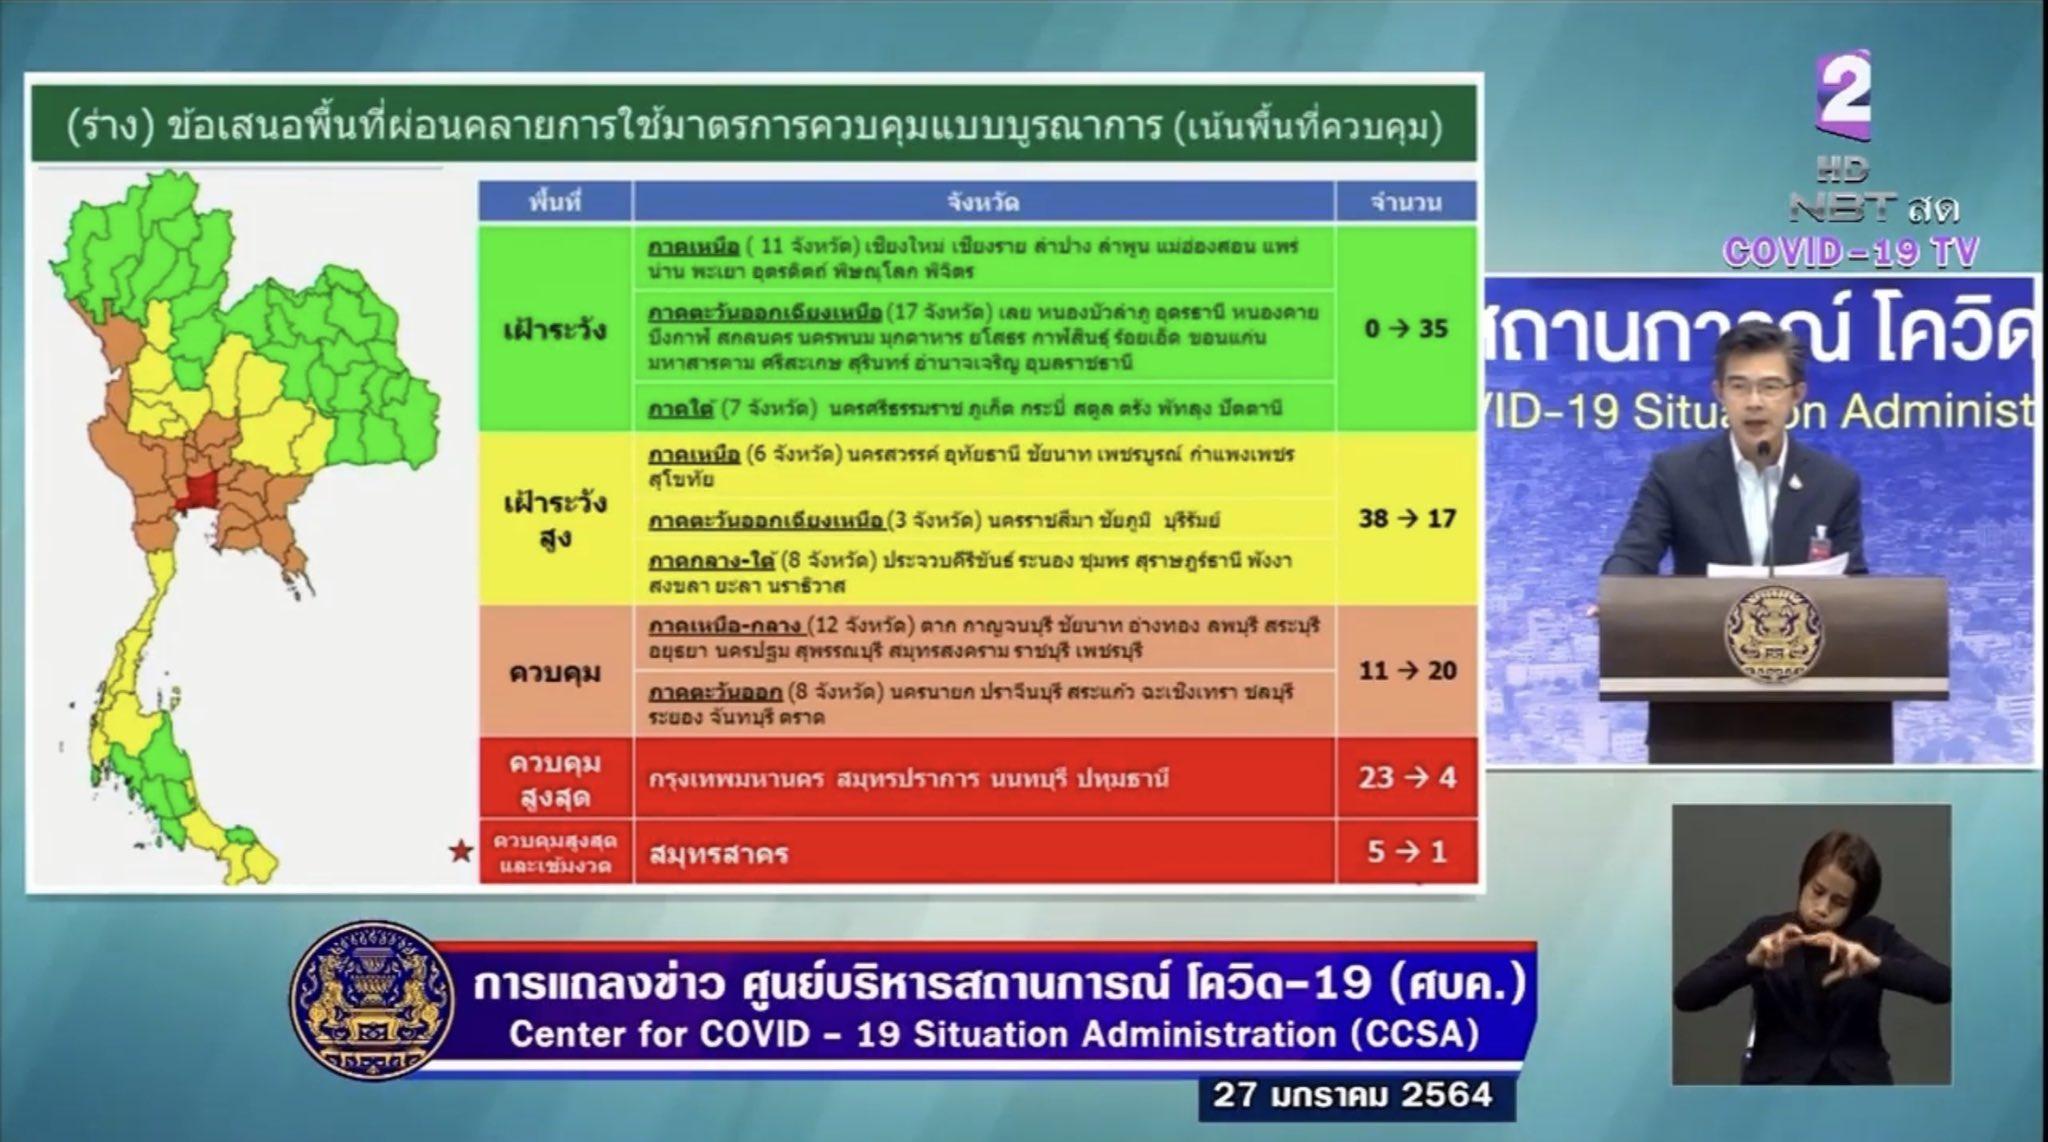 www.thaiguide.dk/images/forum/covid19/covid%20provinser%20farve%2027-01-21.jpeg